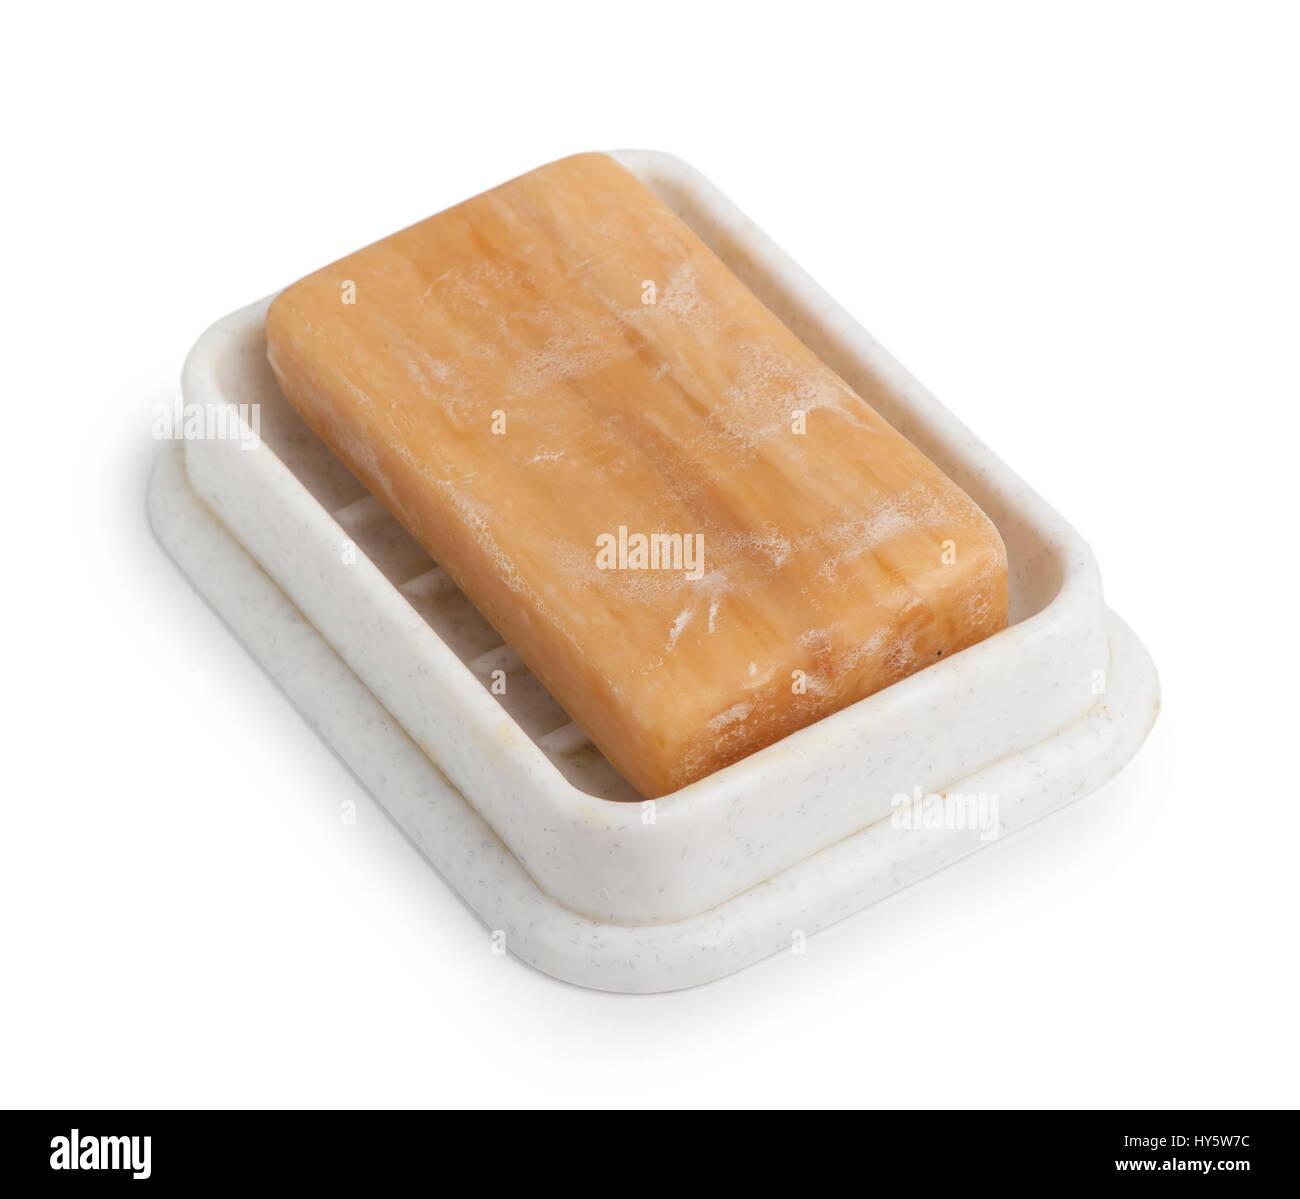 Bar Soap On Soap Dish Stock Photos Amp Bar Soap On Soap Dish